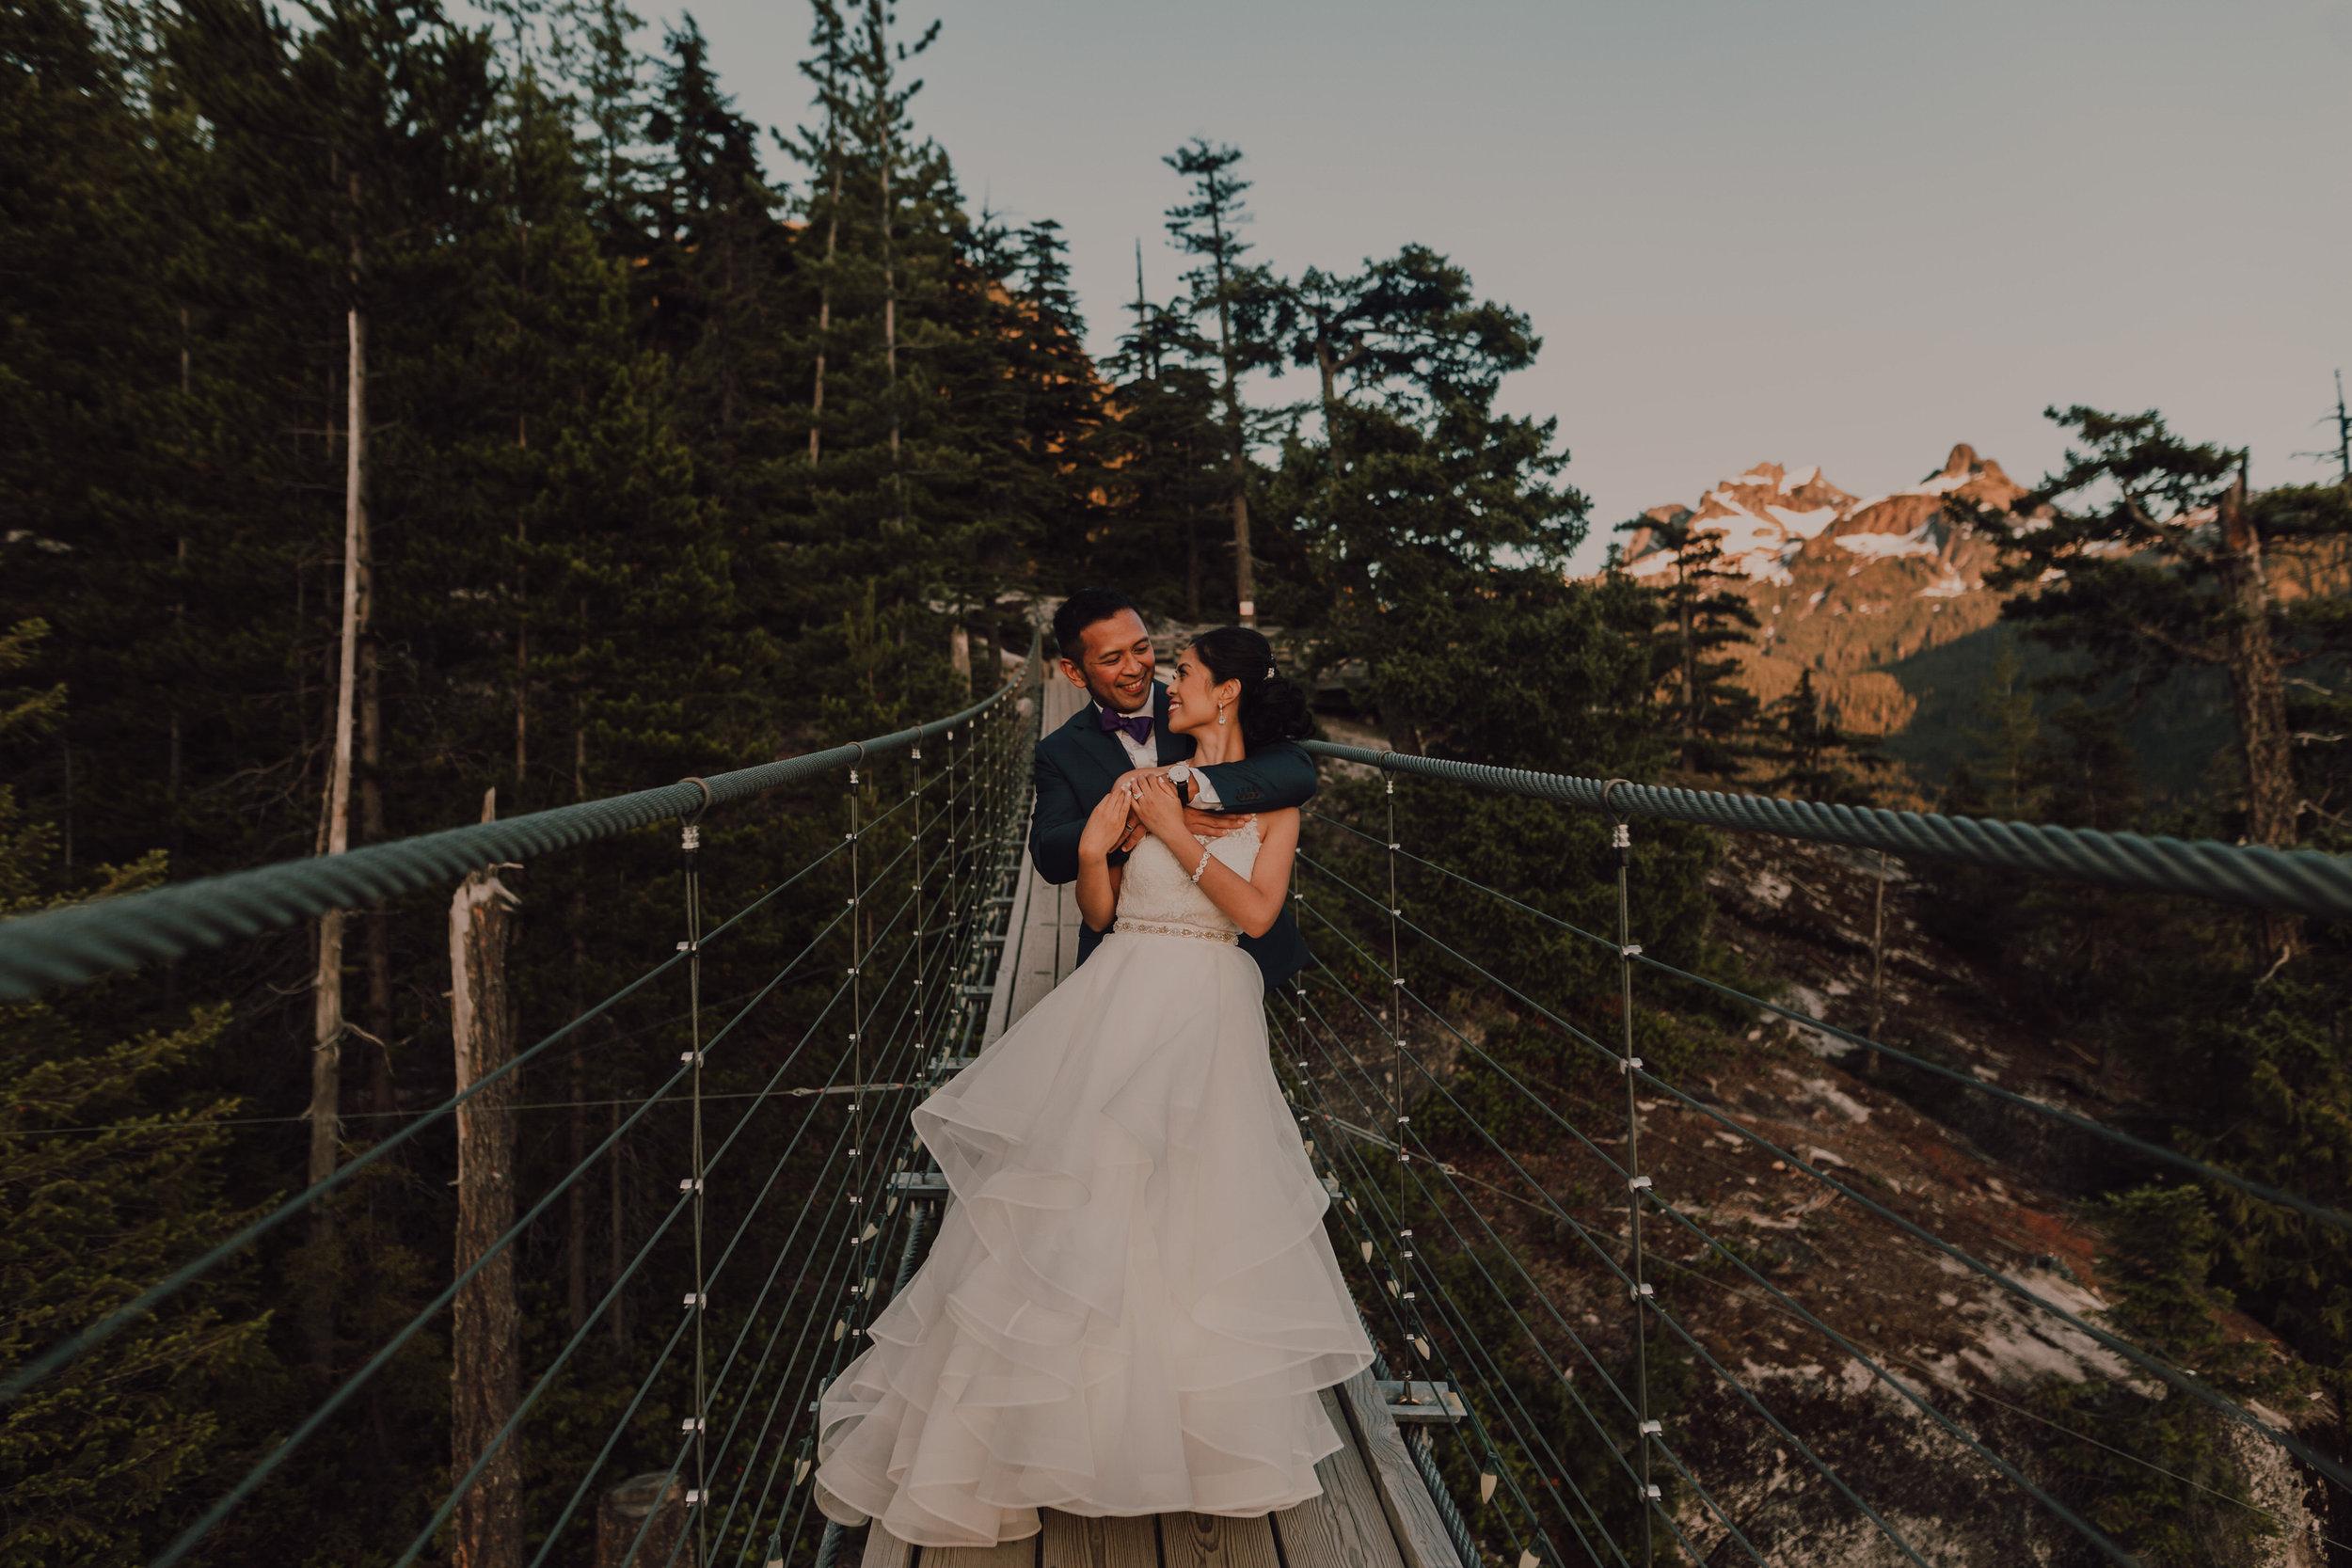 Squamish Wedding Photographer - Sea to Sky Gondola Wedding Photos -  Vancouver Wedding Photographer & Videographer - Sunshine Coast Wedding Photos - Sunshine Coast Wedding Photographer - Jennifer Picard Photography - IMG_5338 (1).jpg